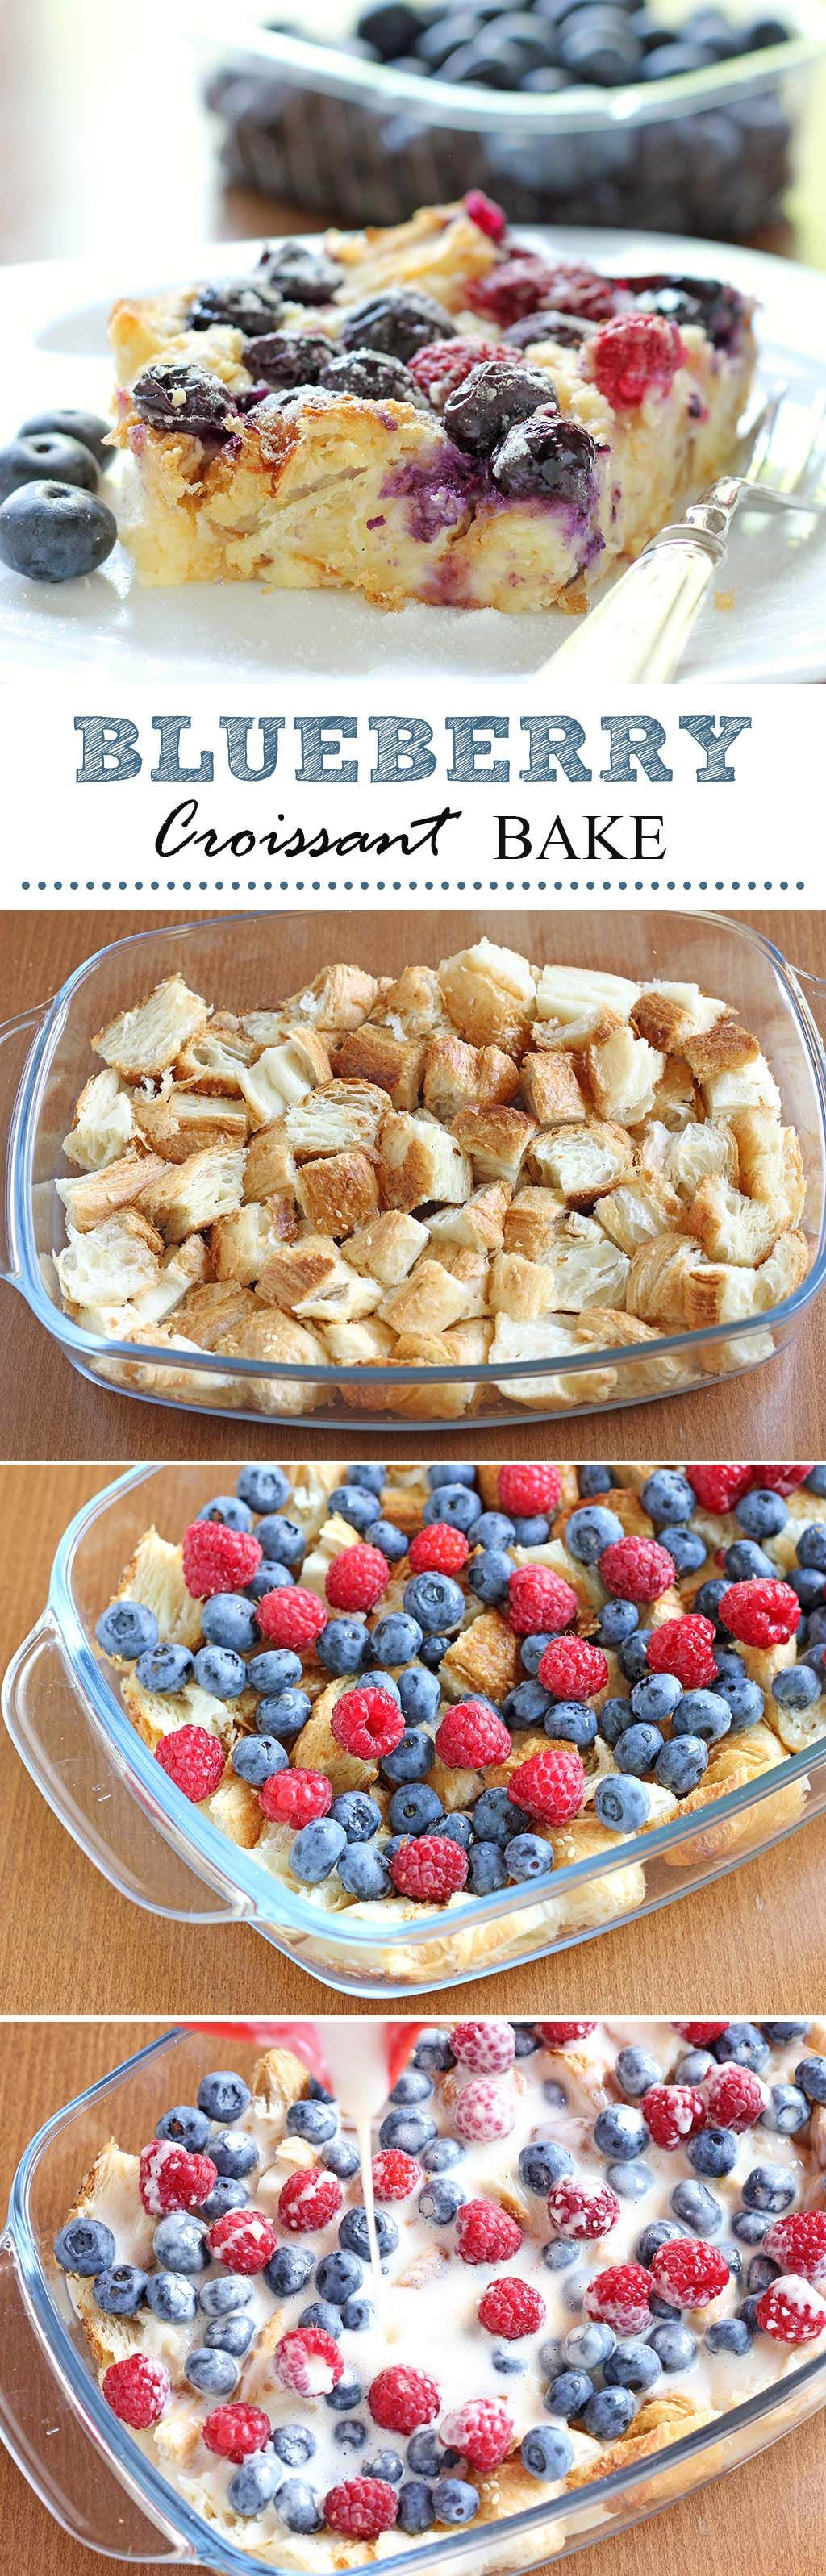 Blueberry Croissant Bake | Cakescottage